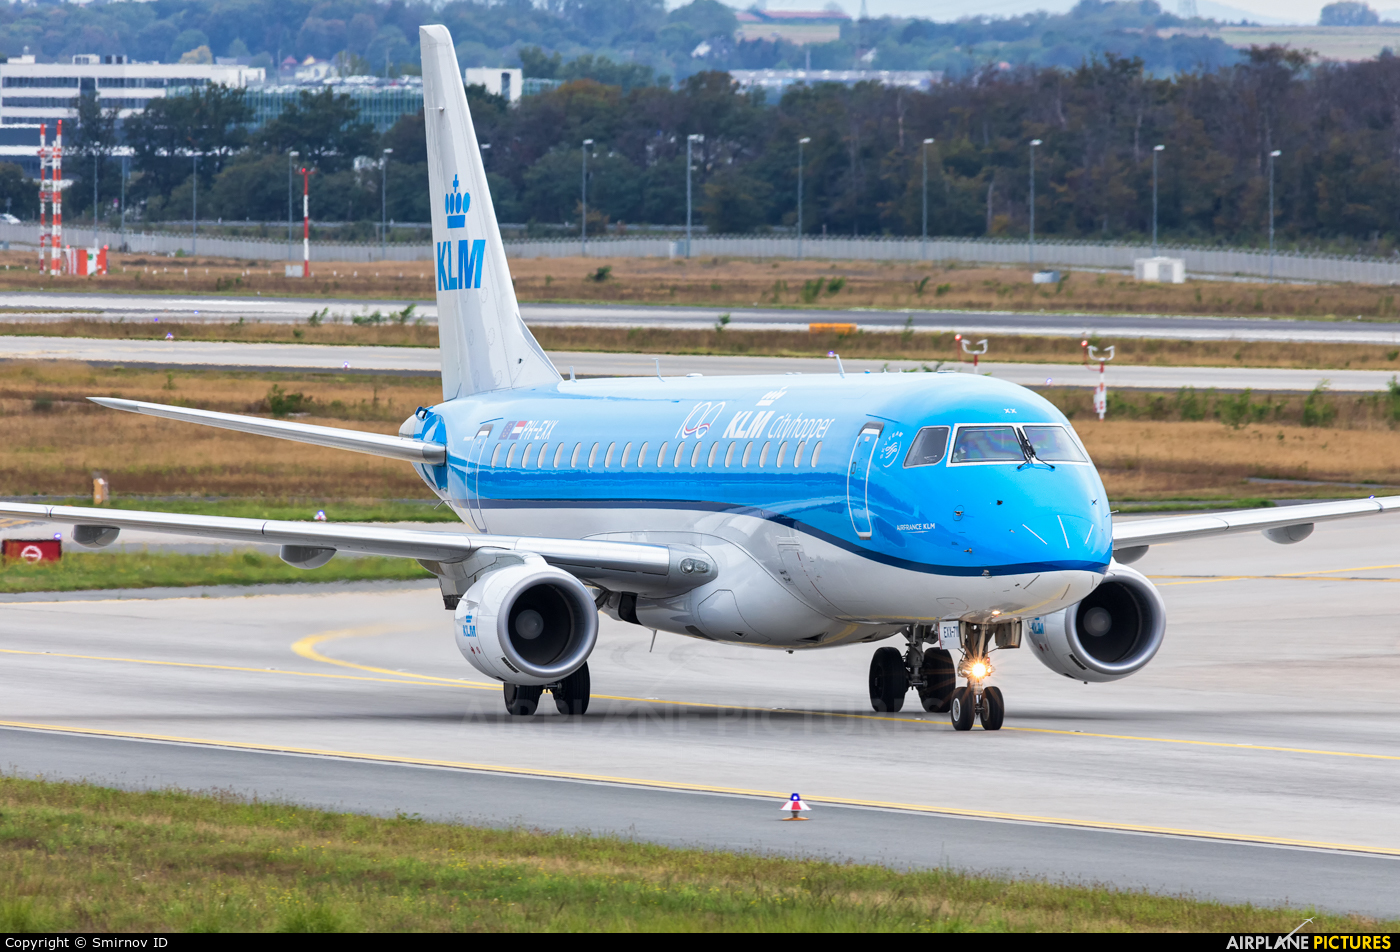 KLM Cityhopper PH-EXX aircraft at Frankfurt